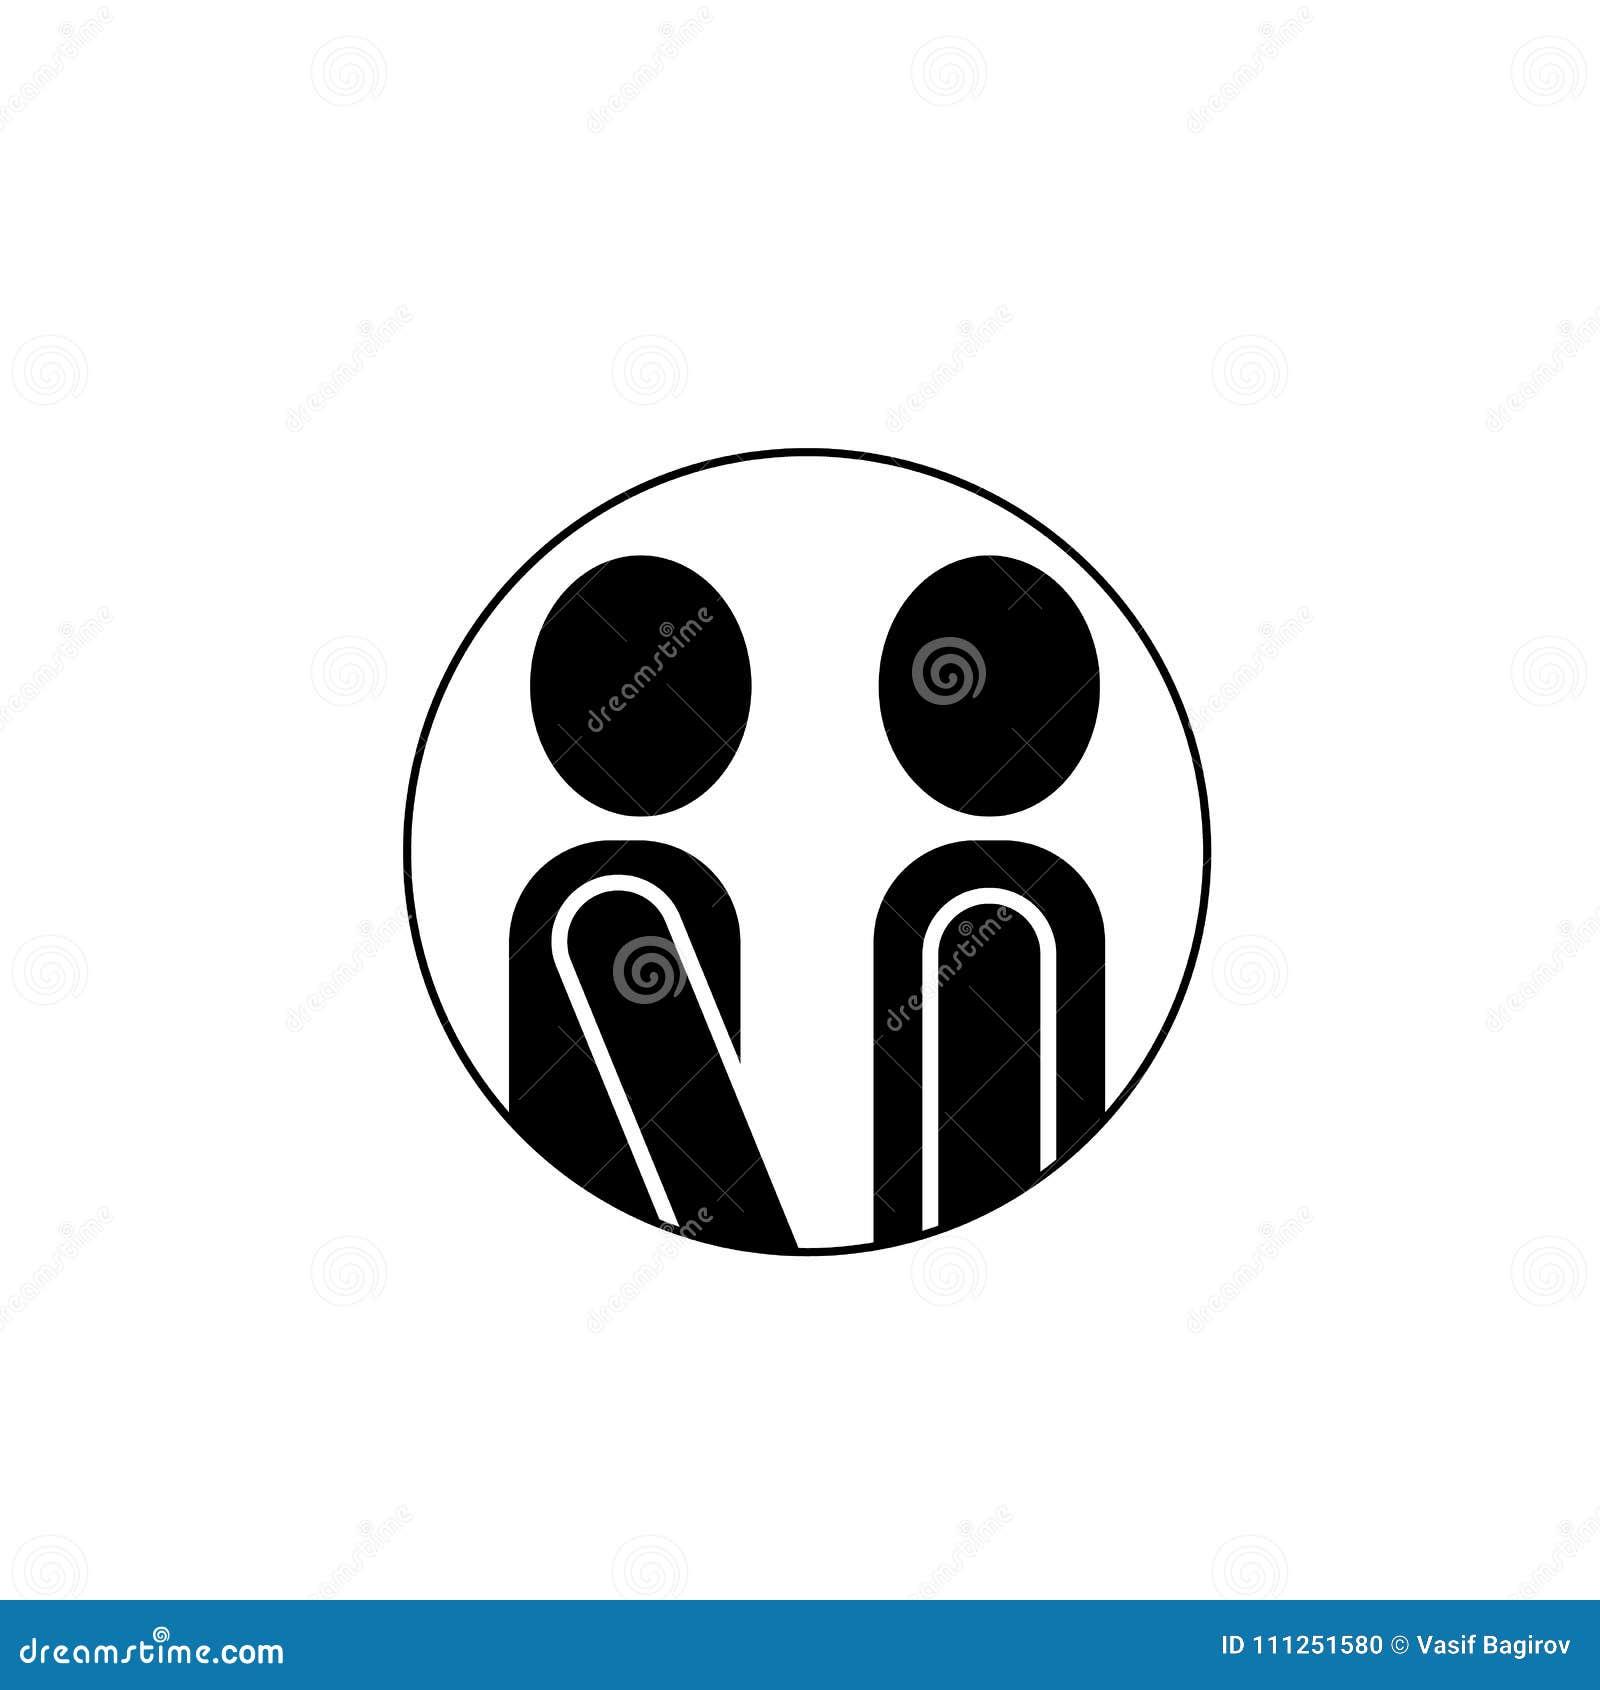 Icon, conversation, speech, bubble, , talk, symbol, illustration, sign, message, chat, communication, design, dialog, discus